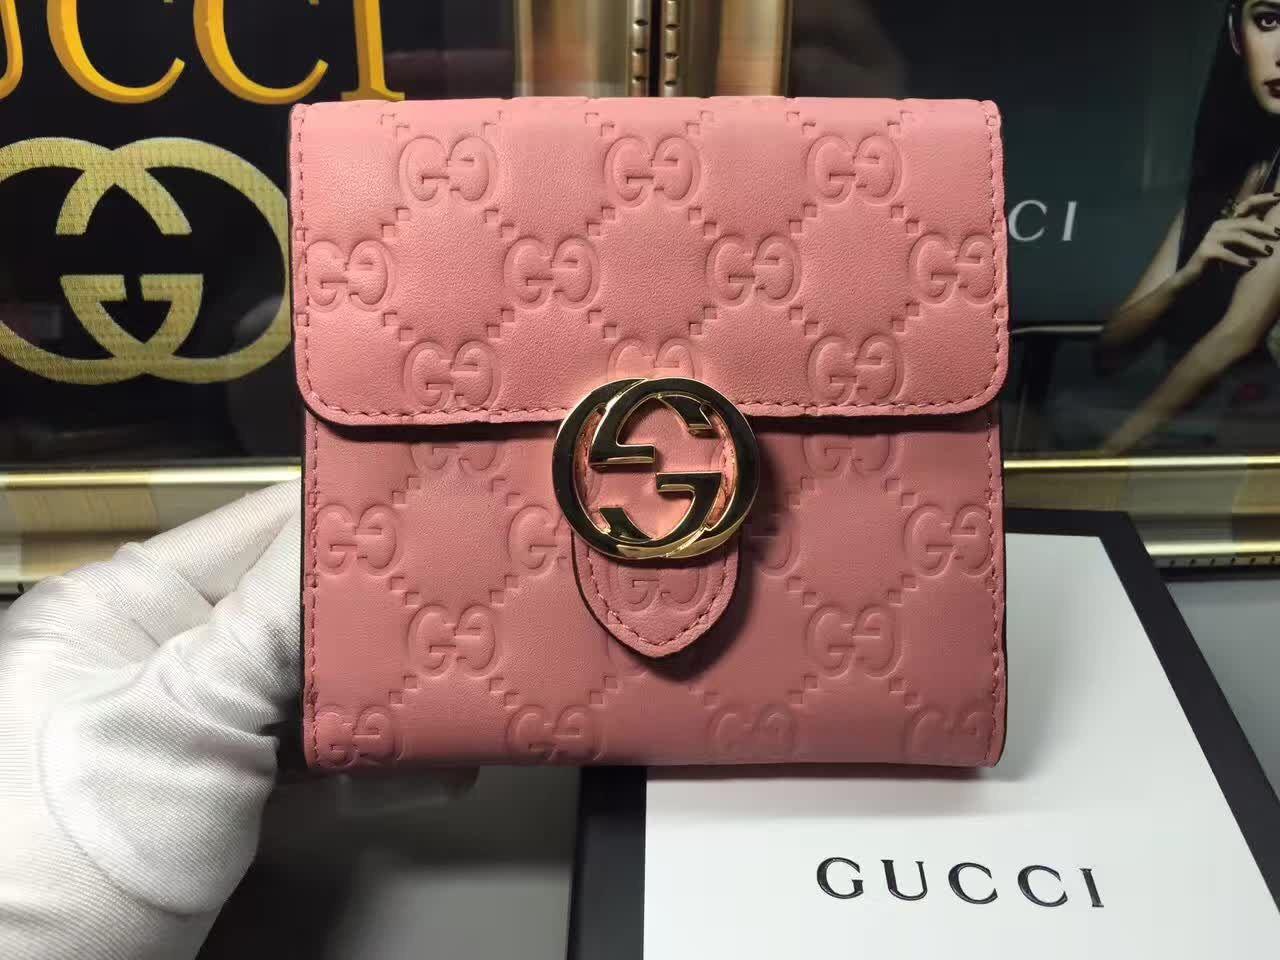 c0690c9e94087d Gucci Women Wallets 369676 | Gucci Wallets | Wallets for women ...